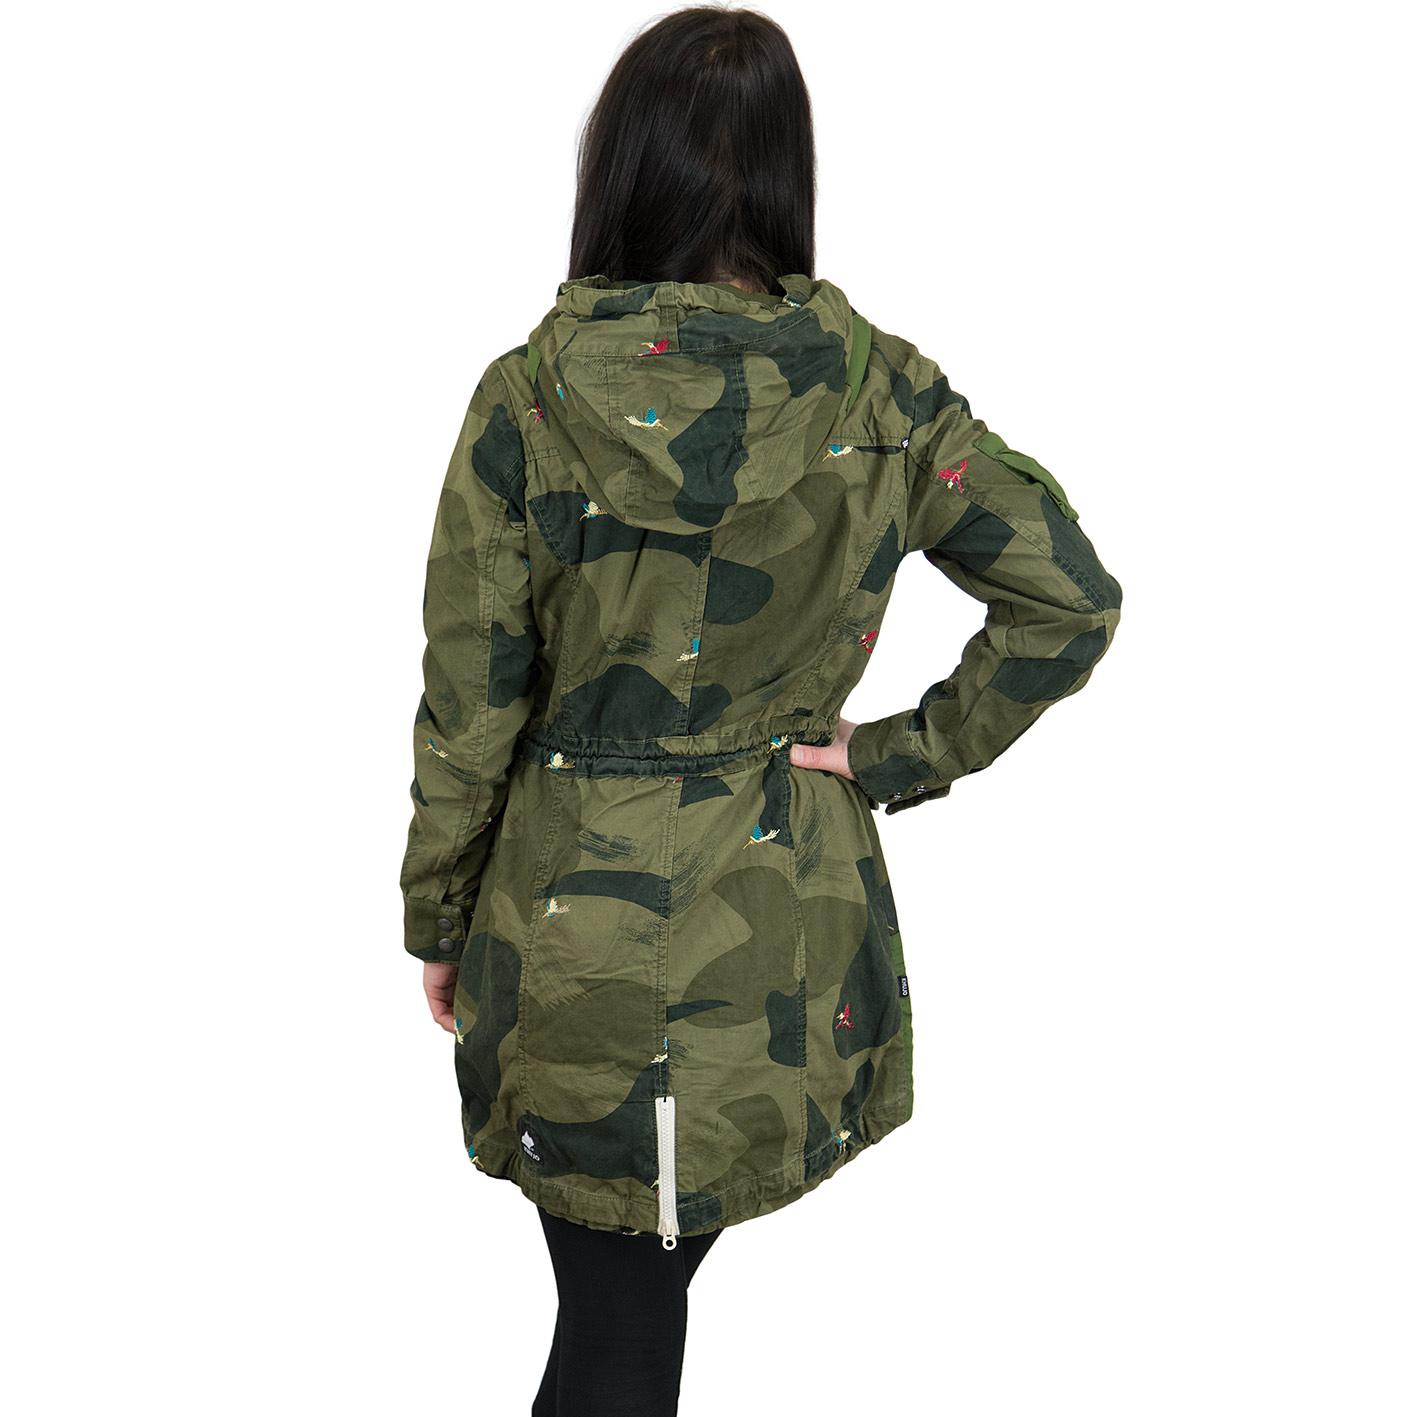 Khujo camouflage jacke